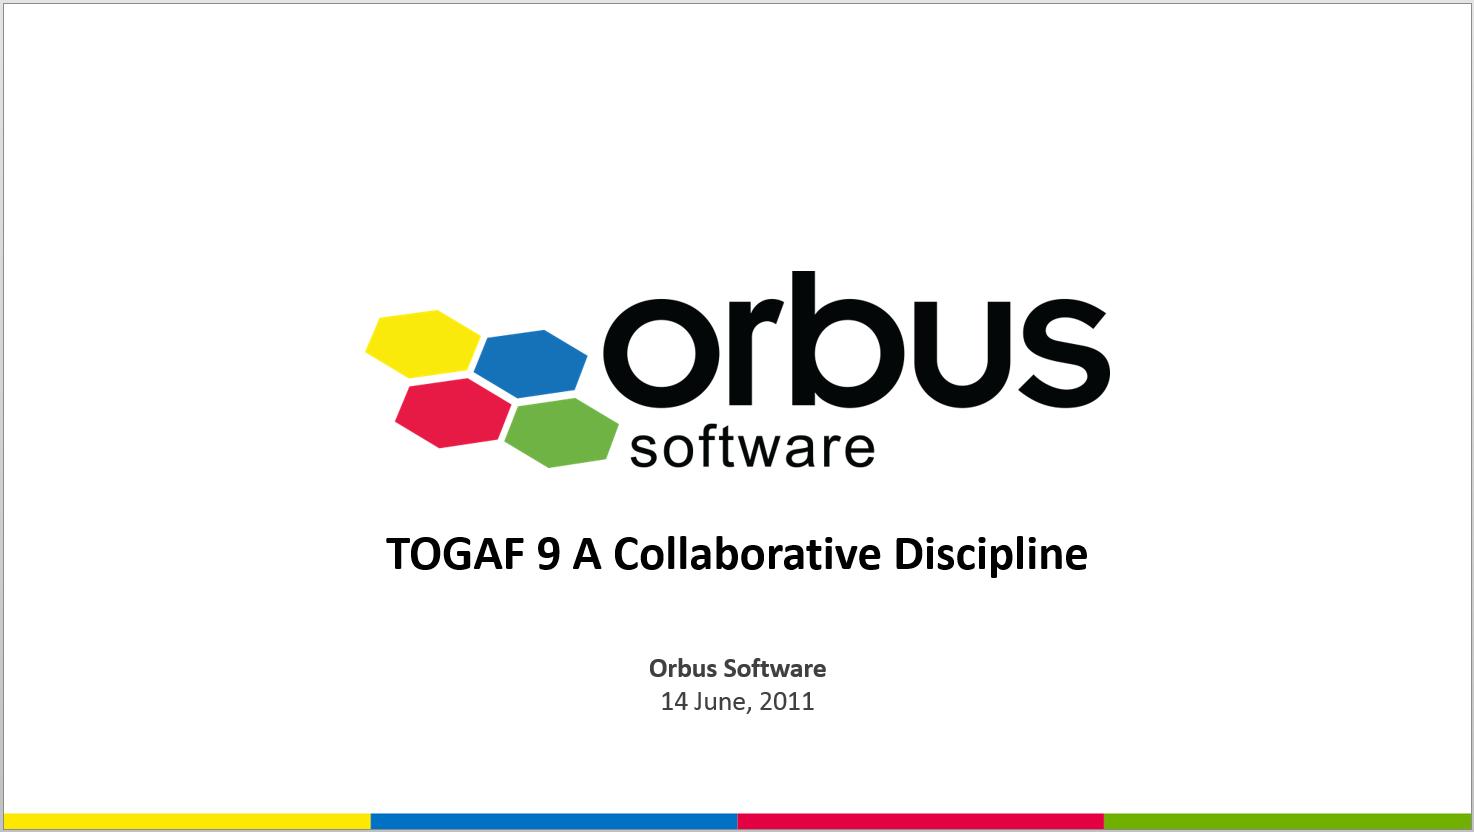 TOGAF 9: A Collaborative Discipline